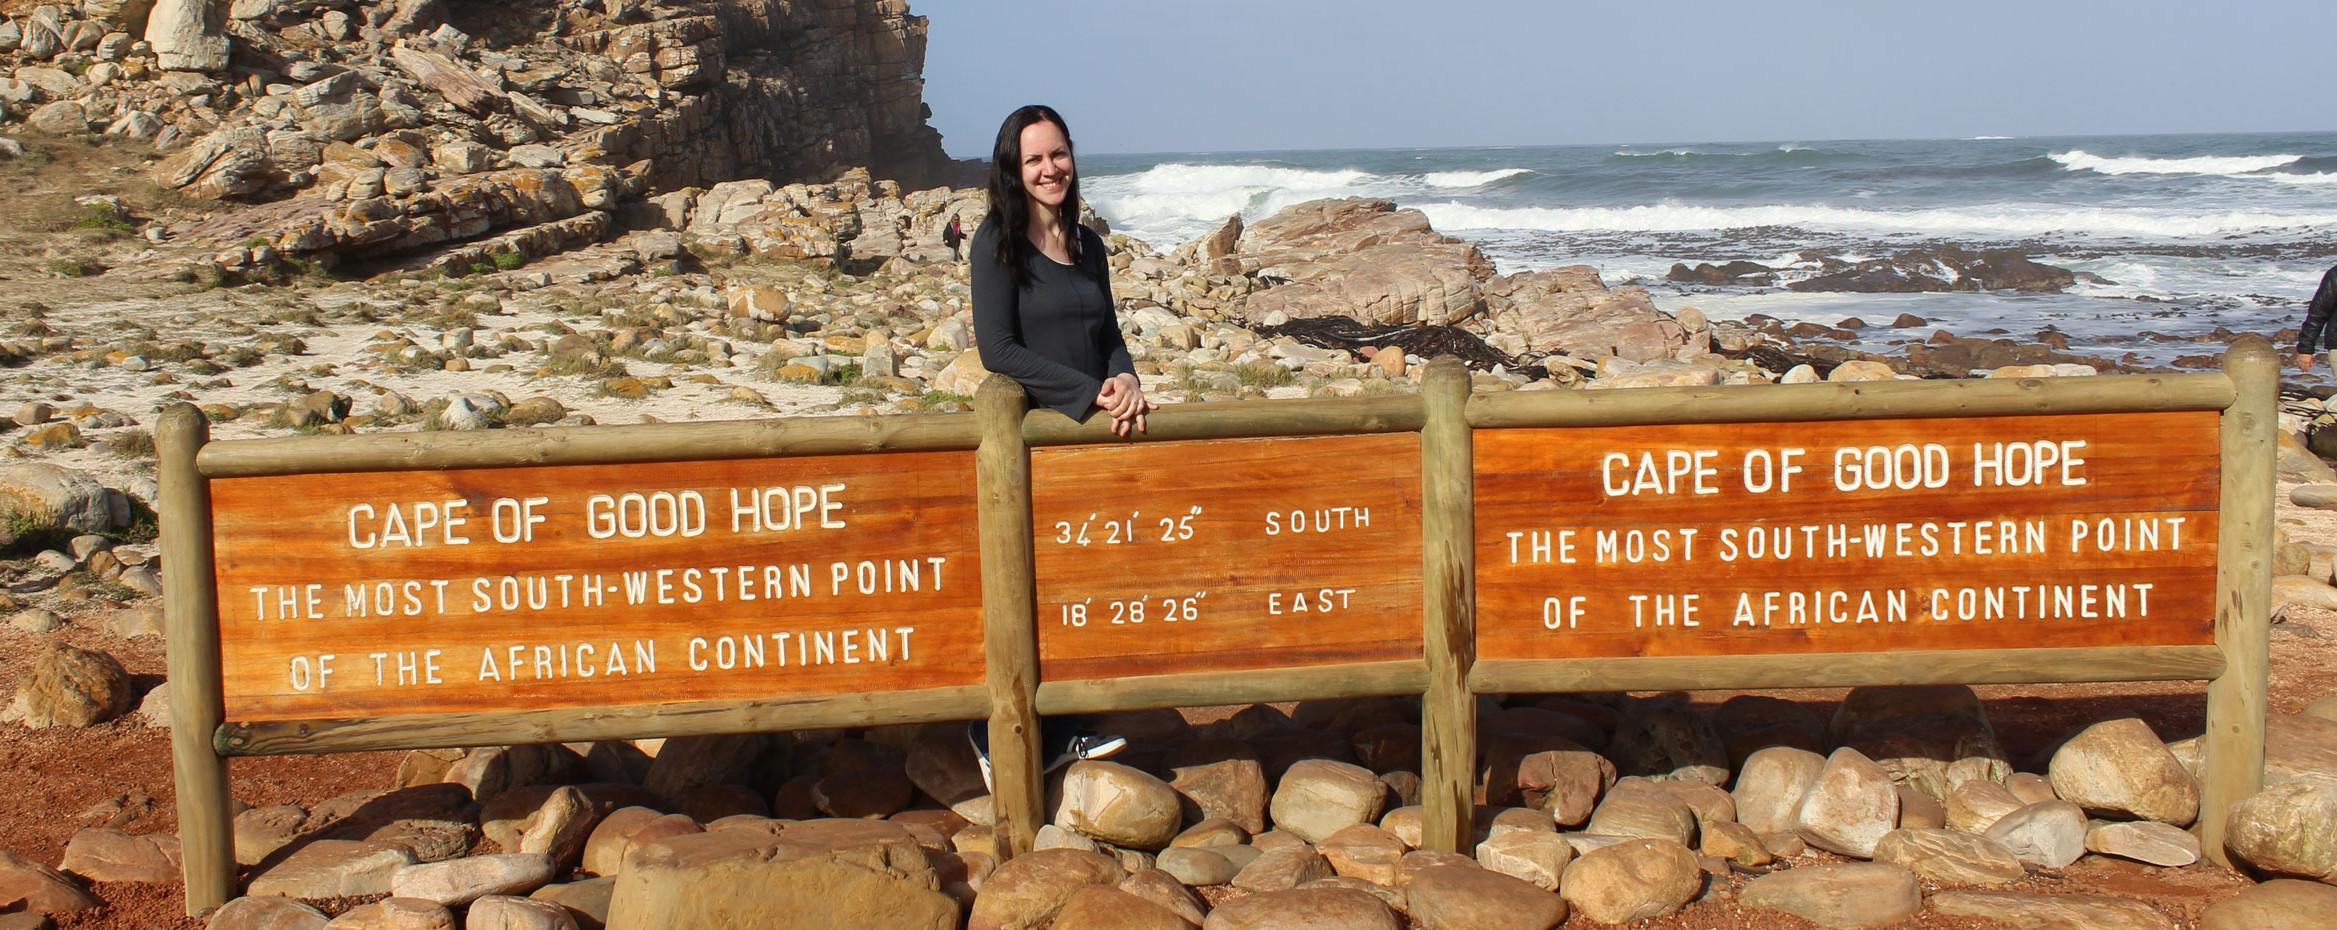 Reisebericht Südafrika - Reiseexpertin Waltraud am Kap der Guten Hoffnung